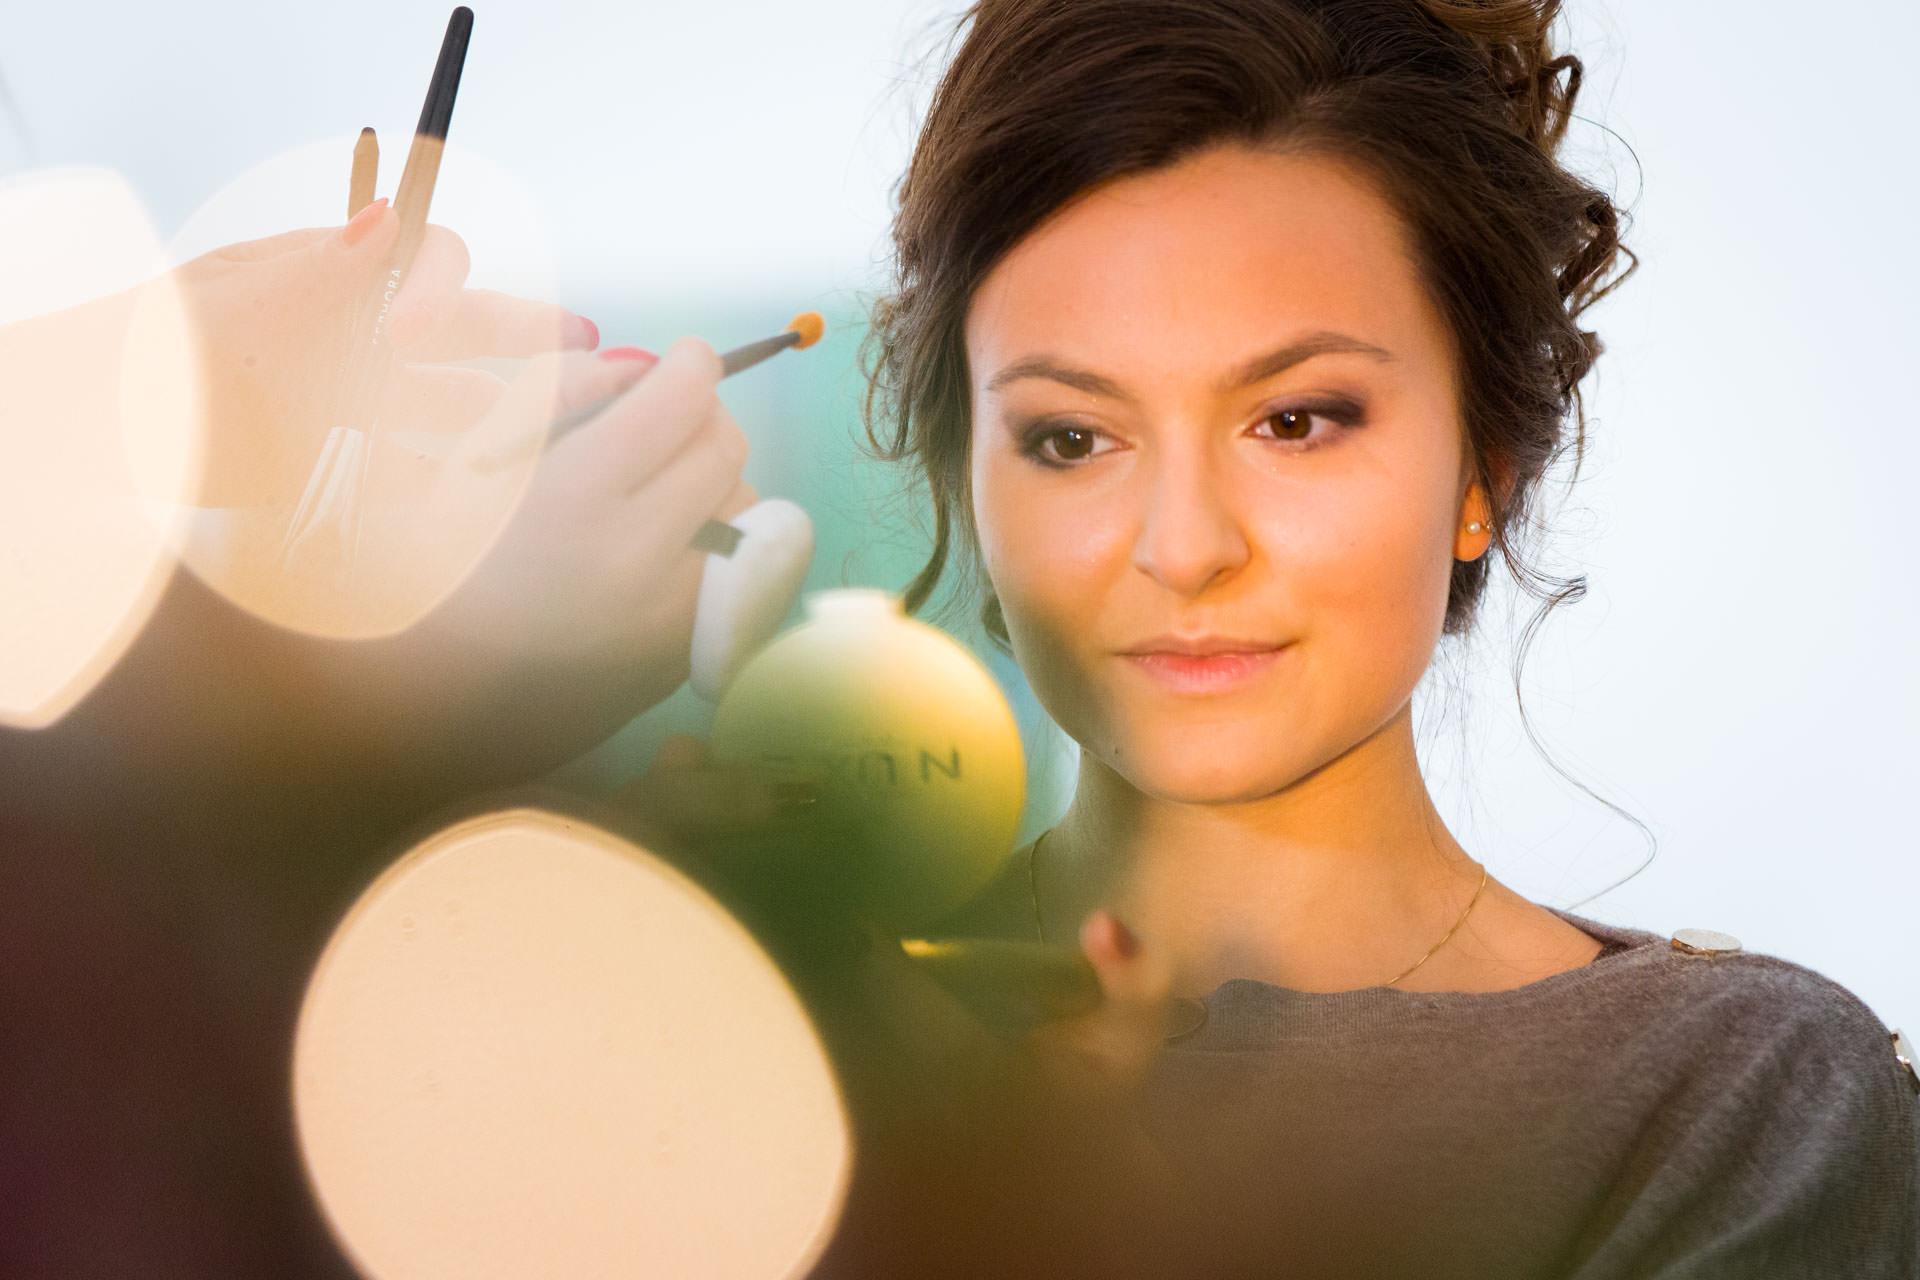 Photographe de Mariage Rock maquillage effet